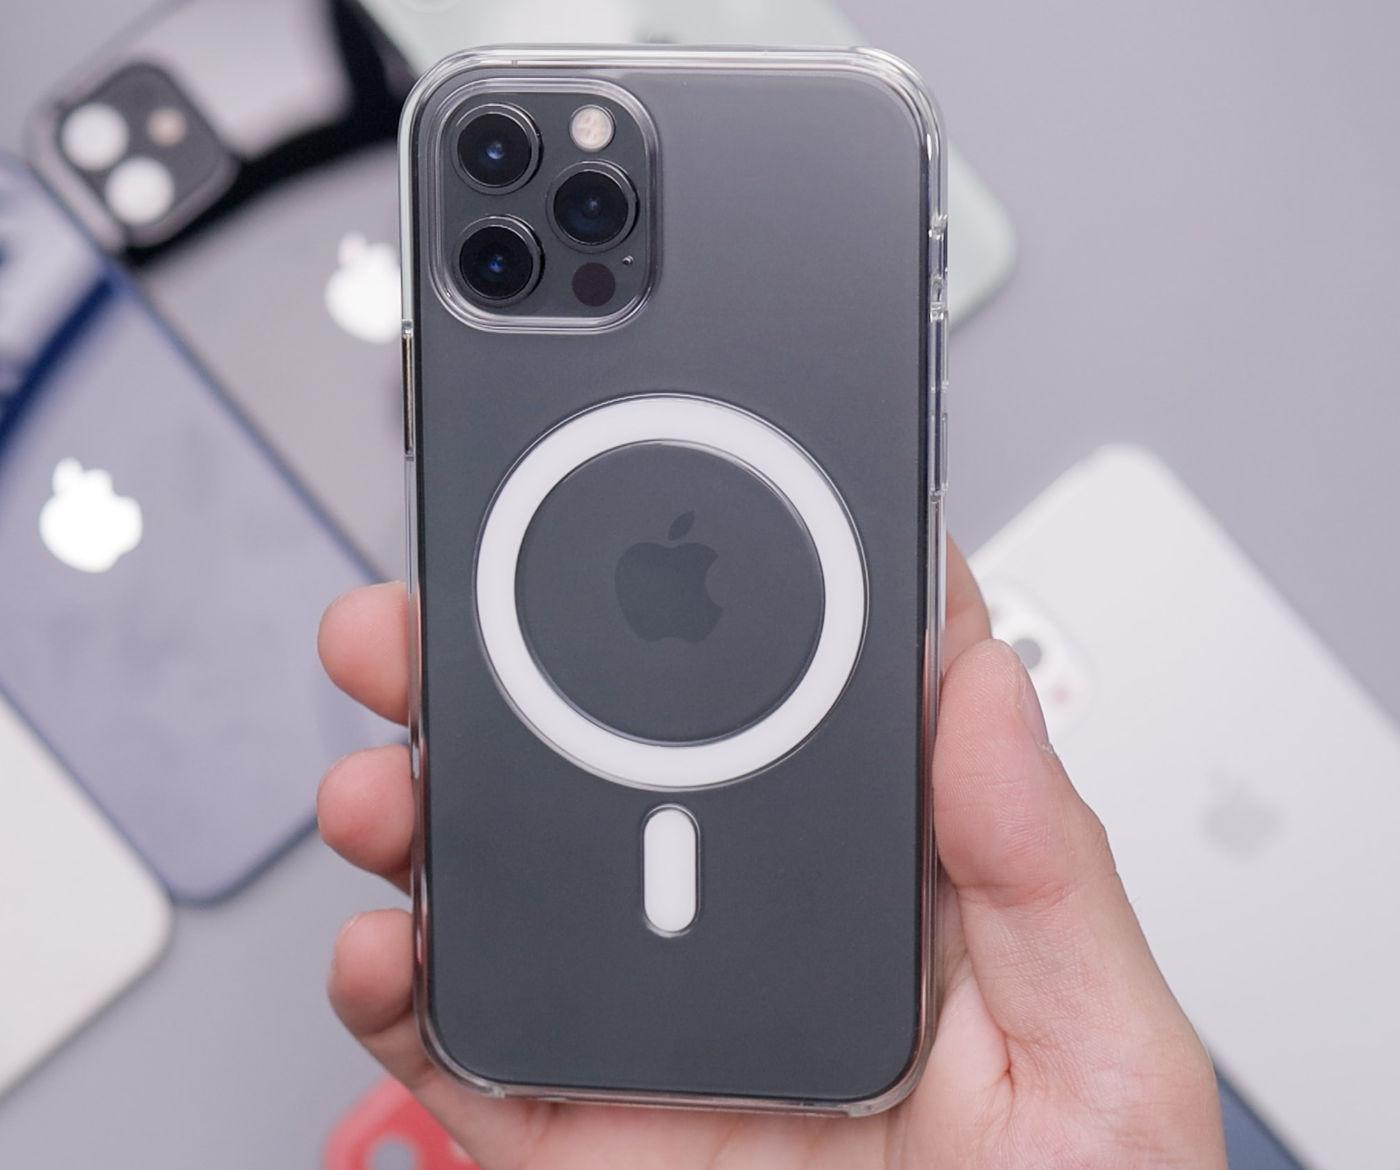 IPhone13 magsafe largercoil